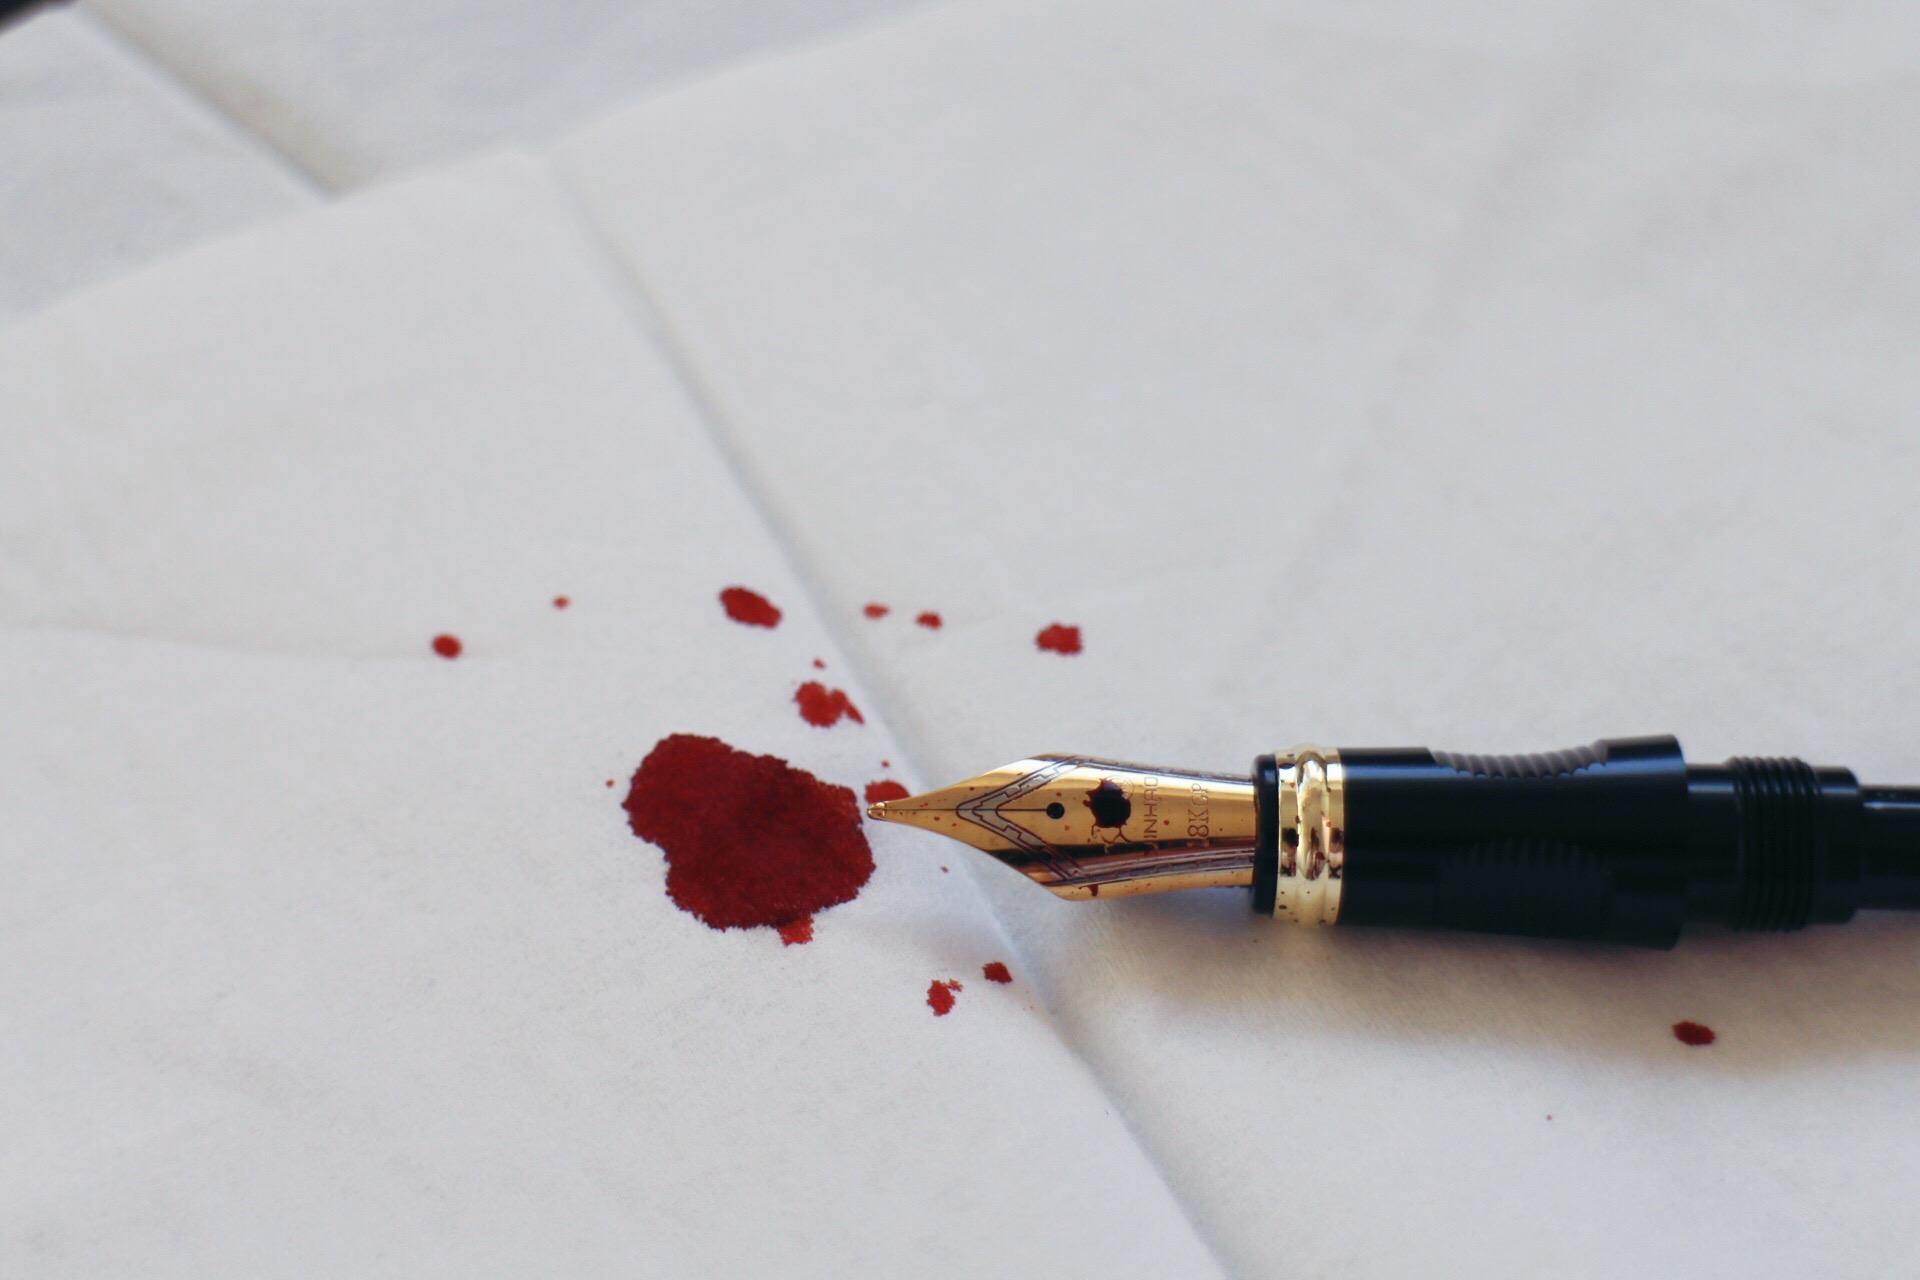 My Top 3 Favorite Fountain Pens